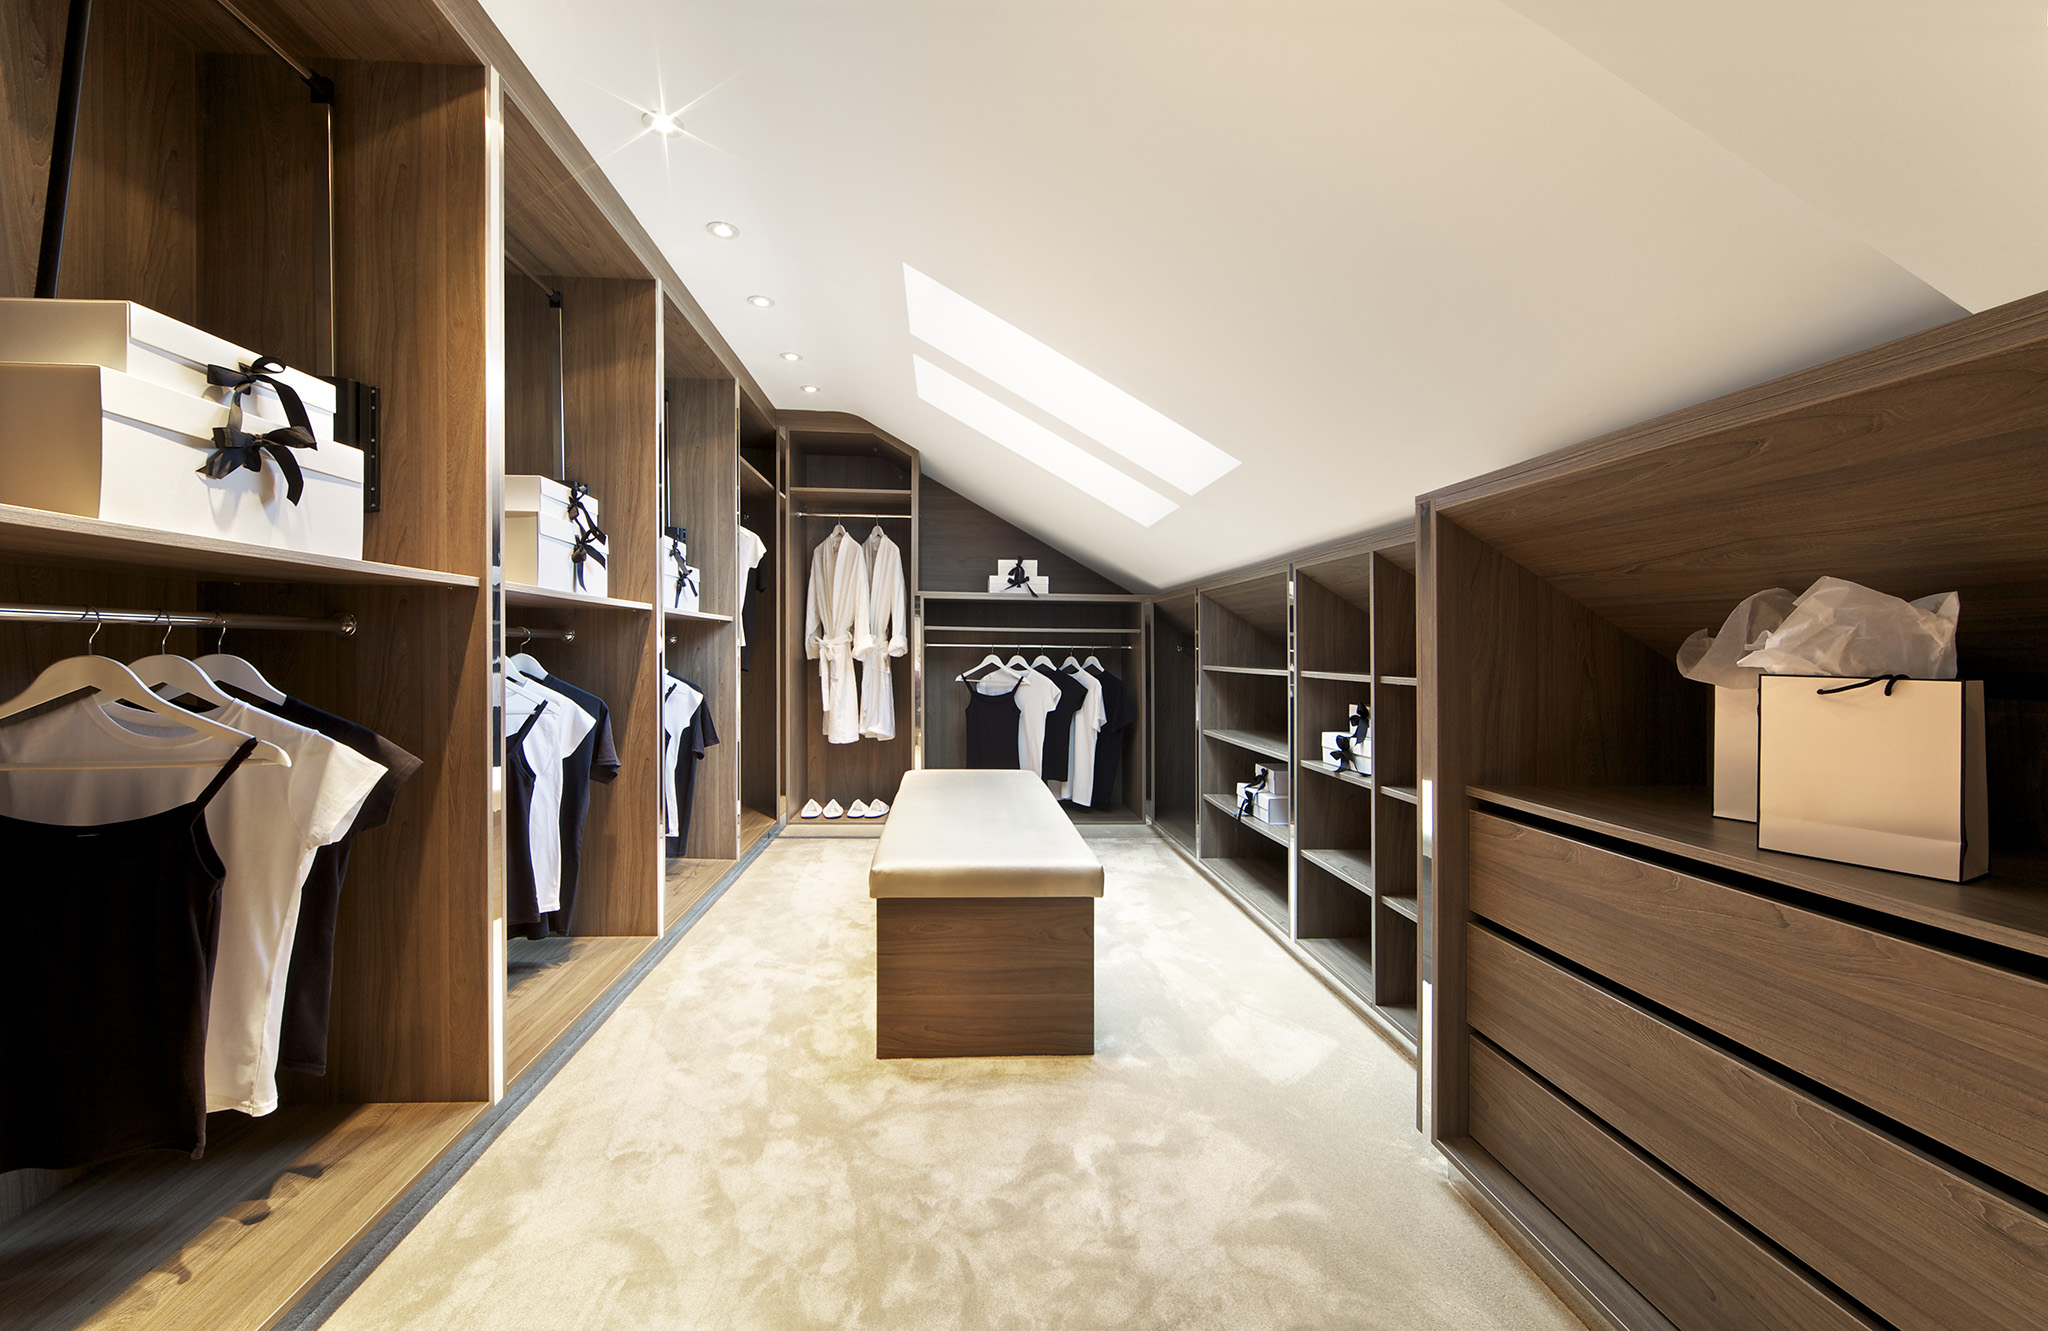 custome wardrobes, walk in wardrobe design, angled wardrobes